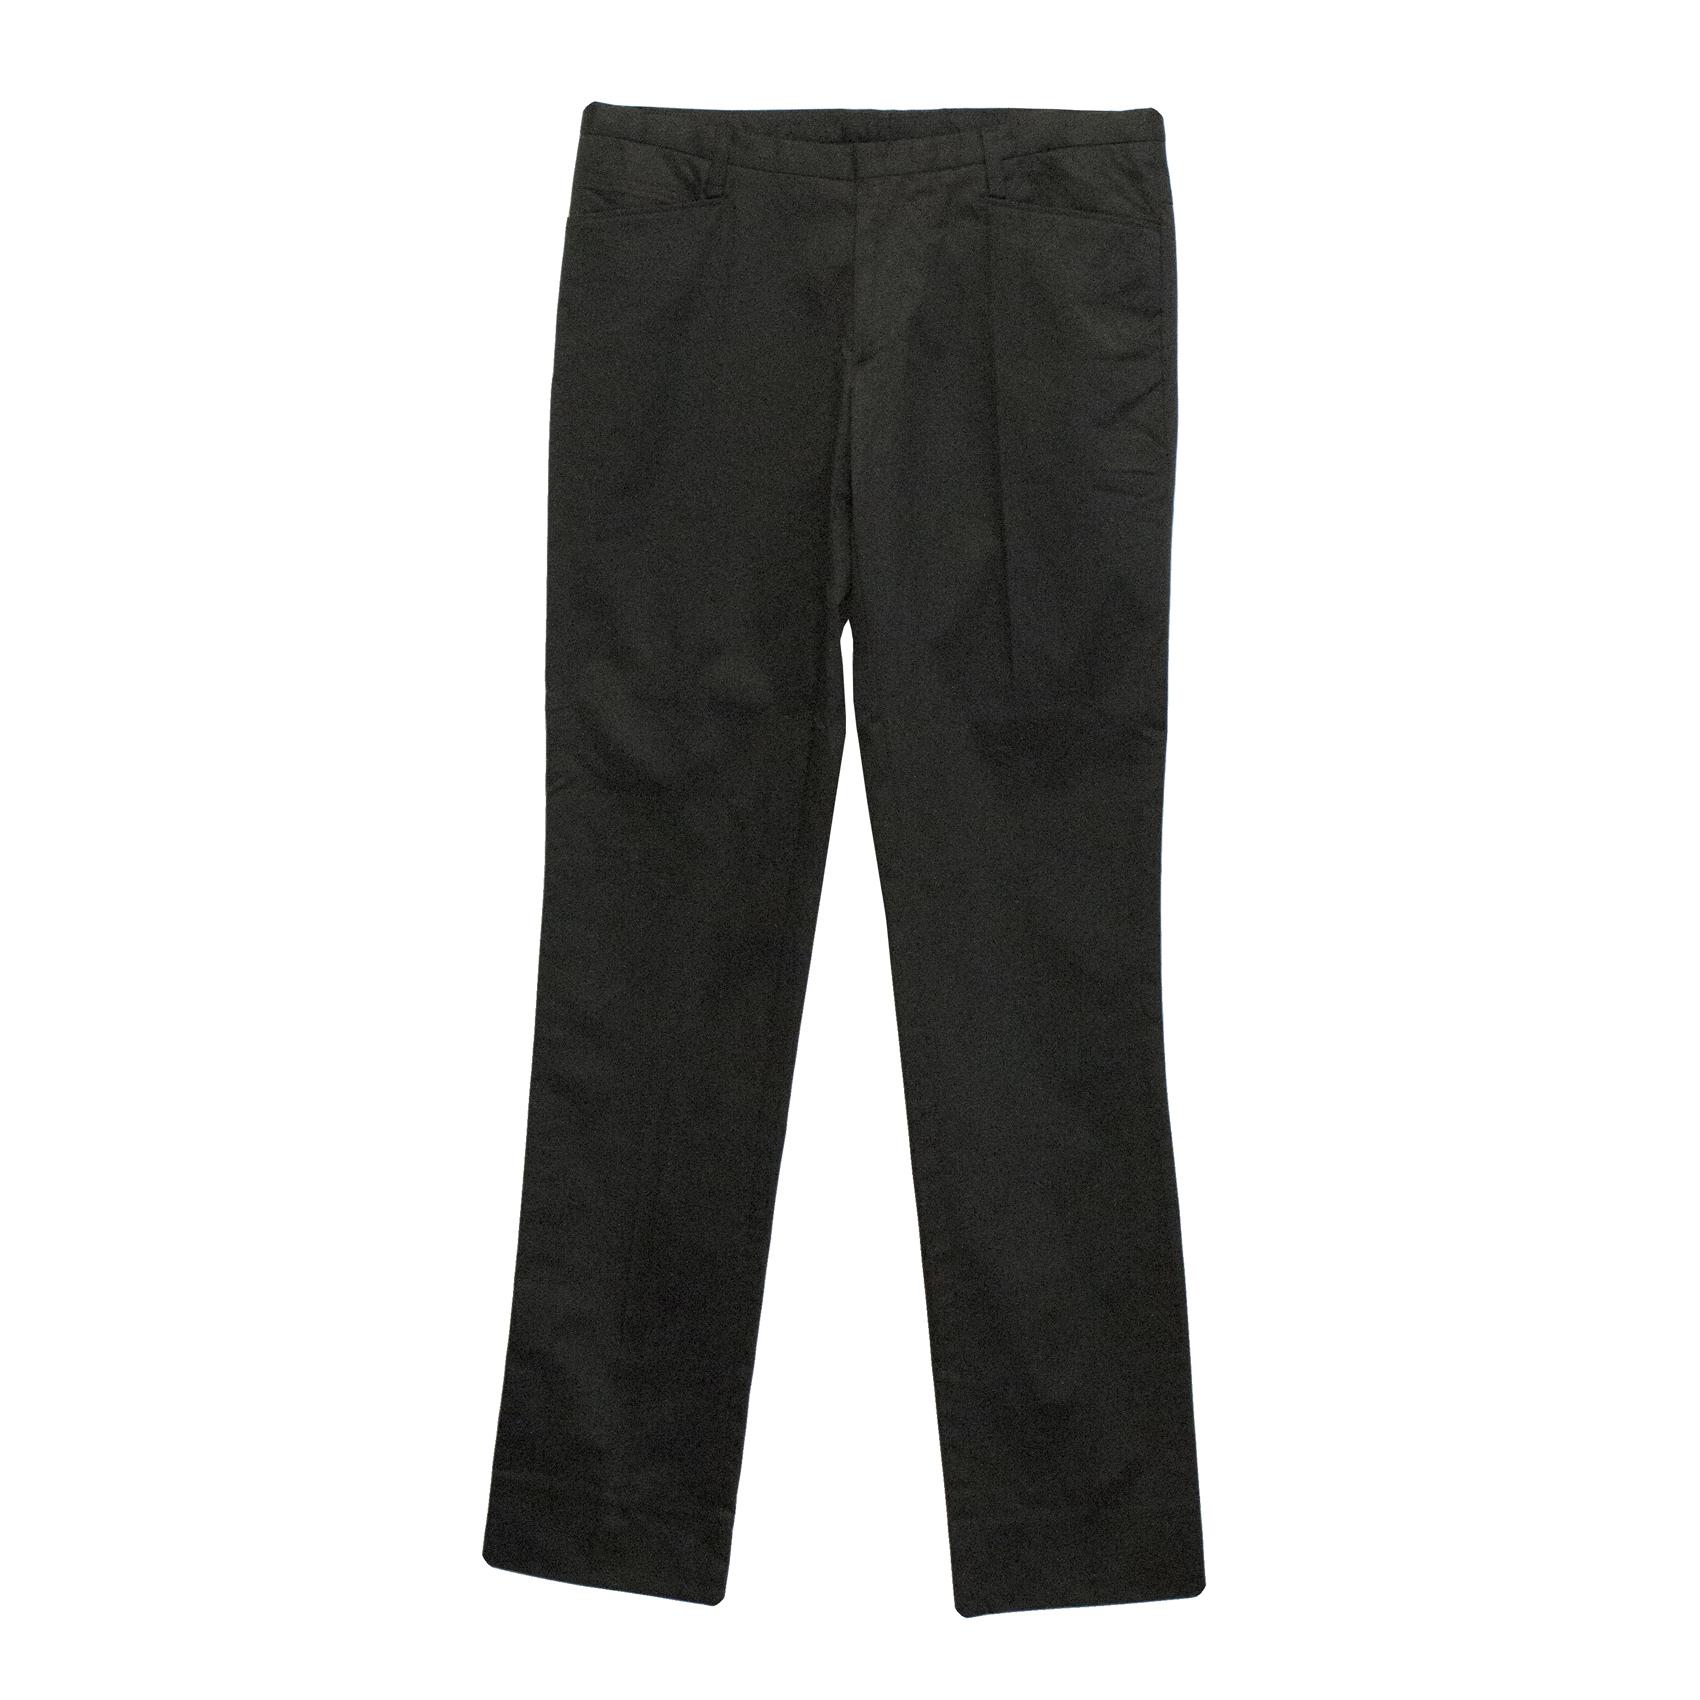 J Lindeberg black trousers